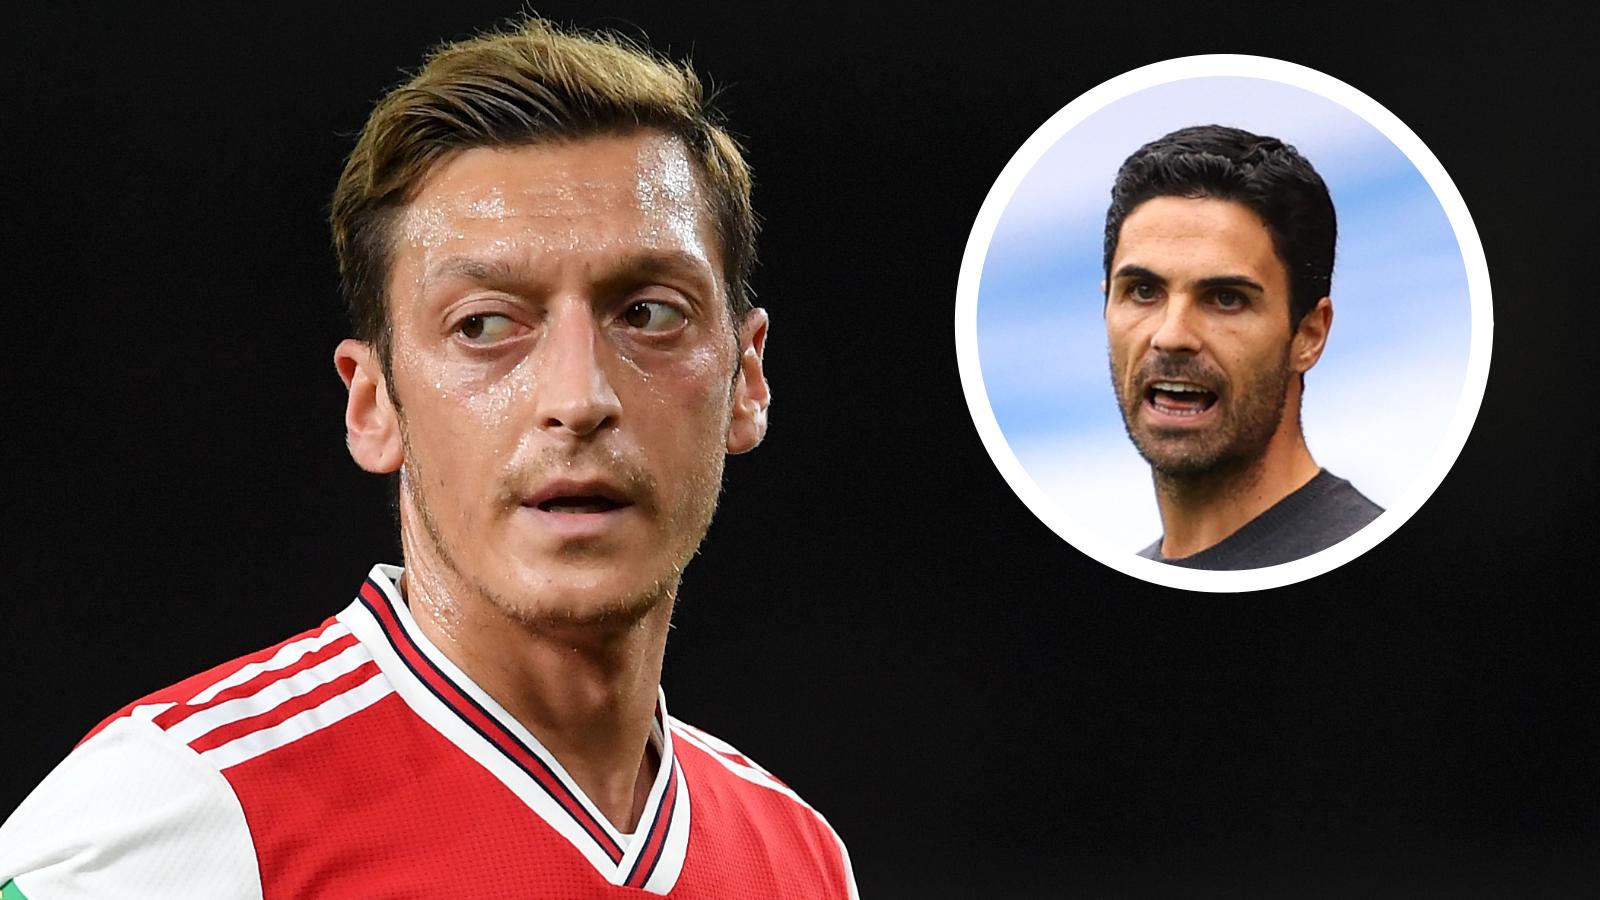 Arsenal's January transfer dealings hold key to Ozil's future, says Arteta